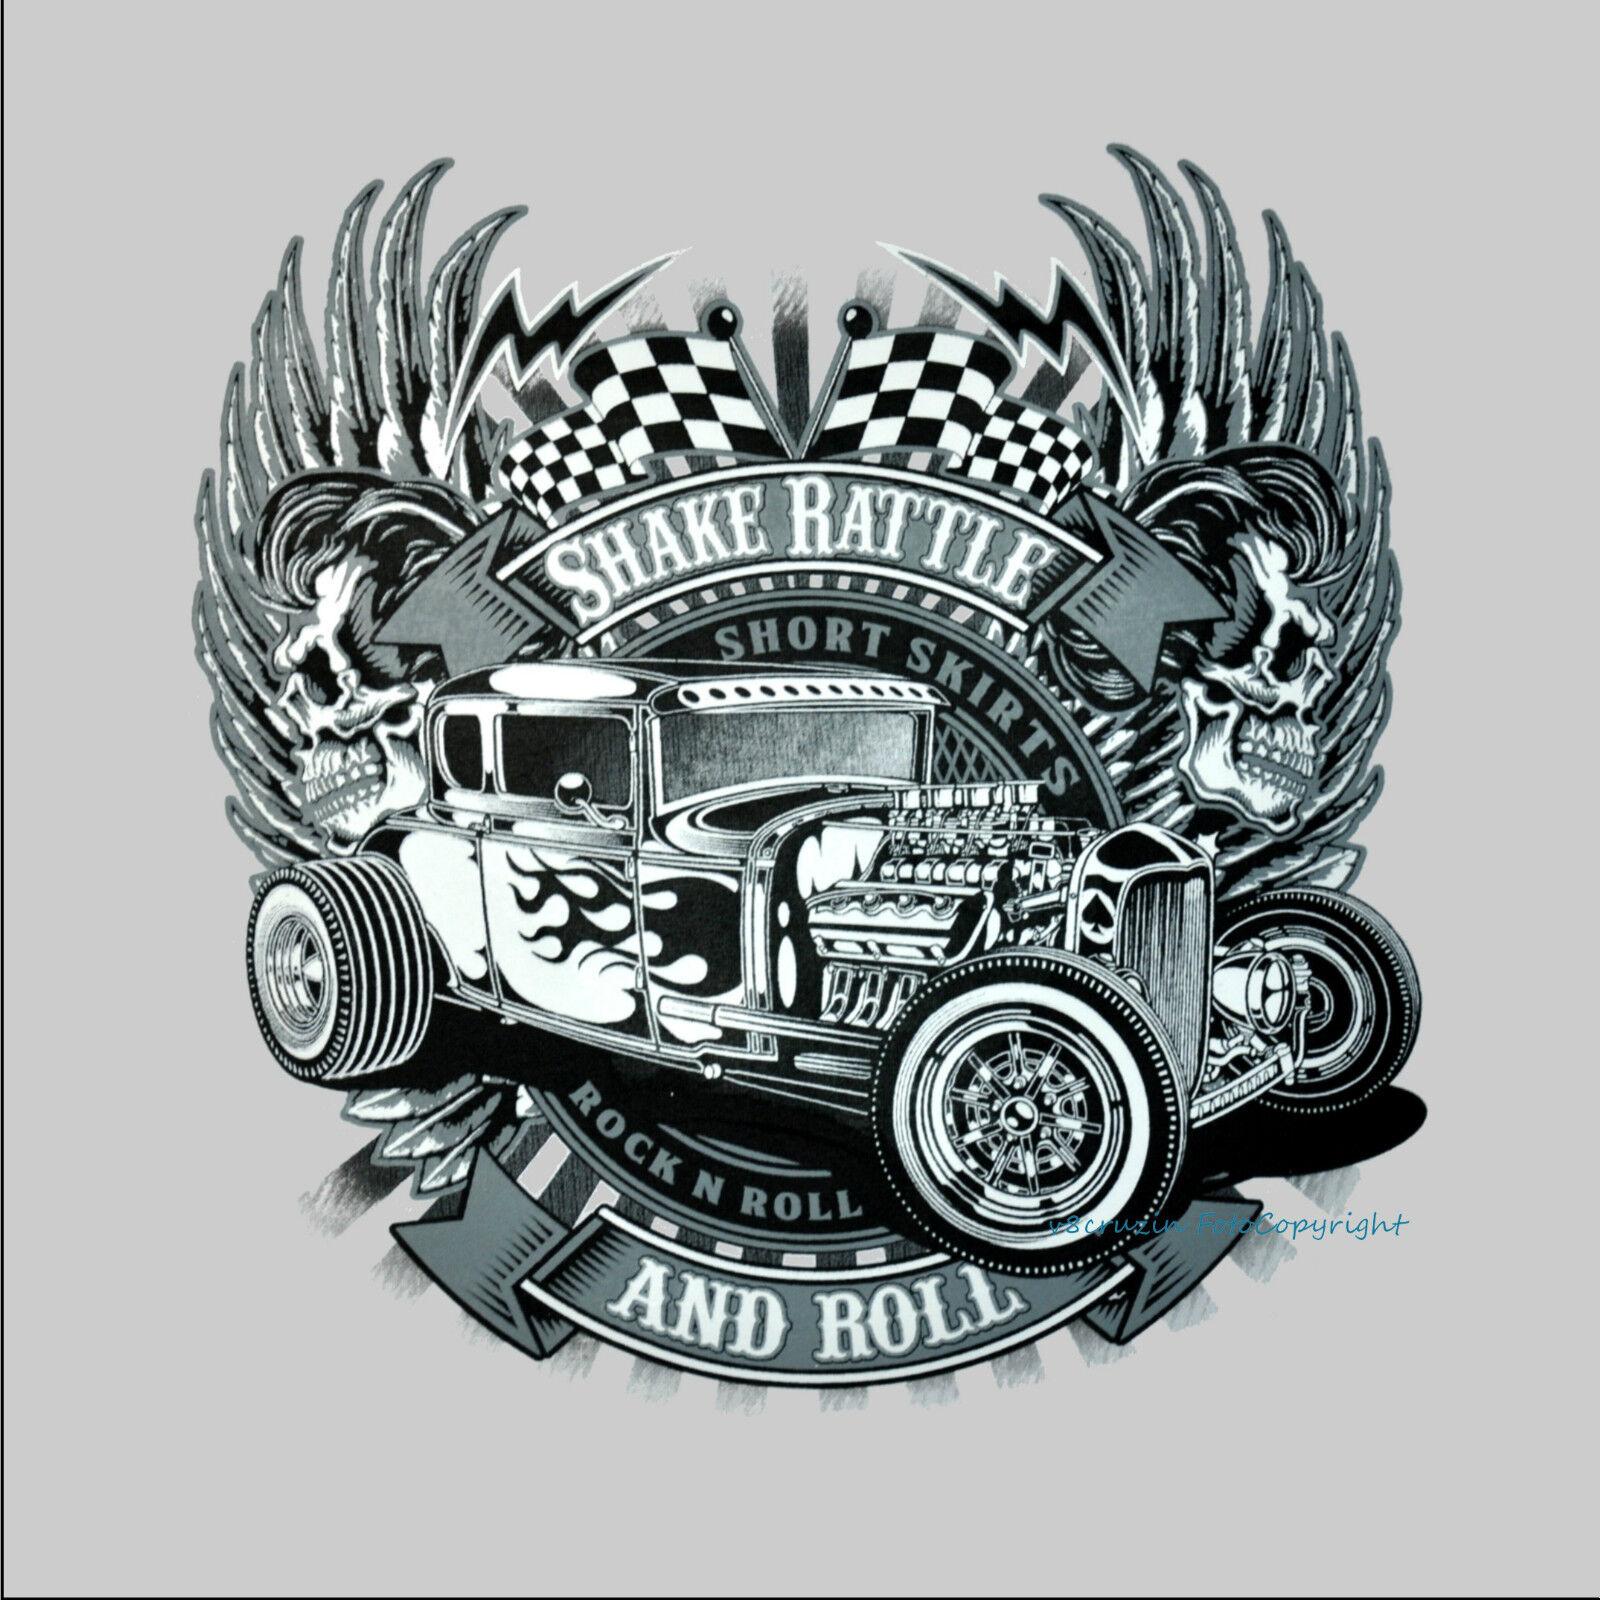 1050 Camicia Maglietta Worker Auto Sportiva Autoracing Rat Garage Vintage Team